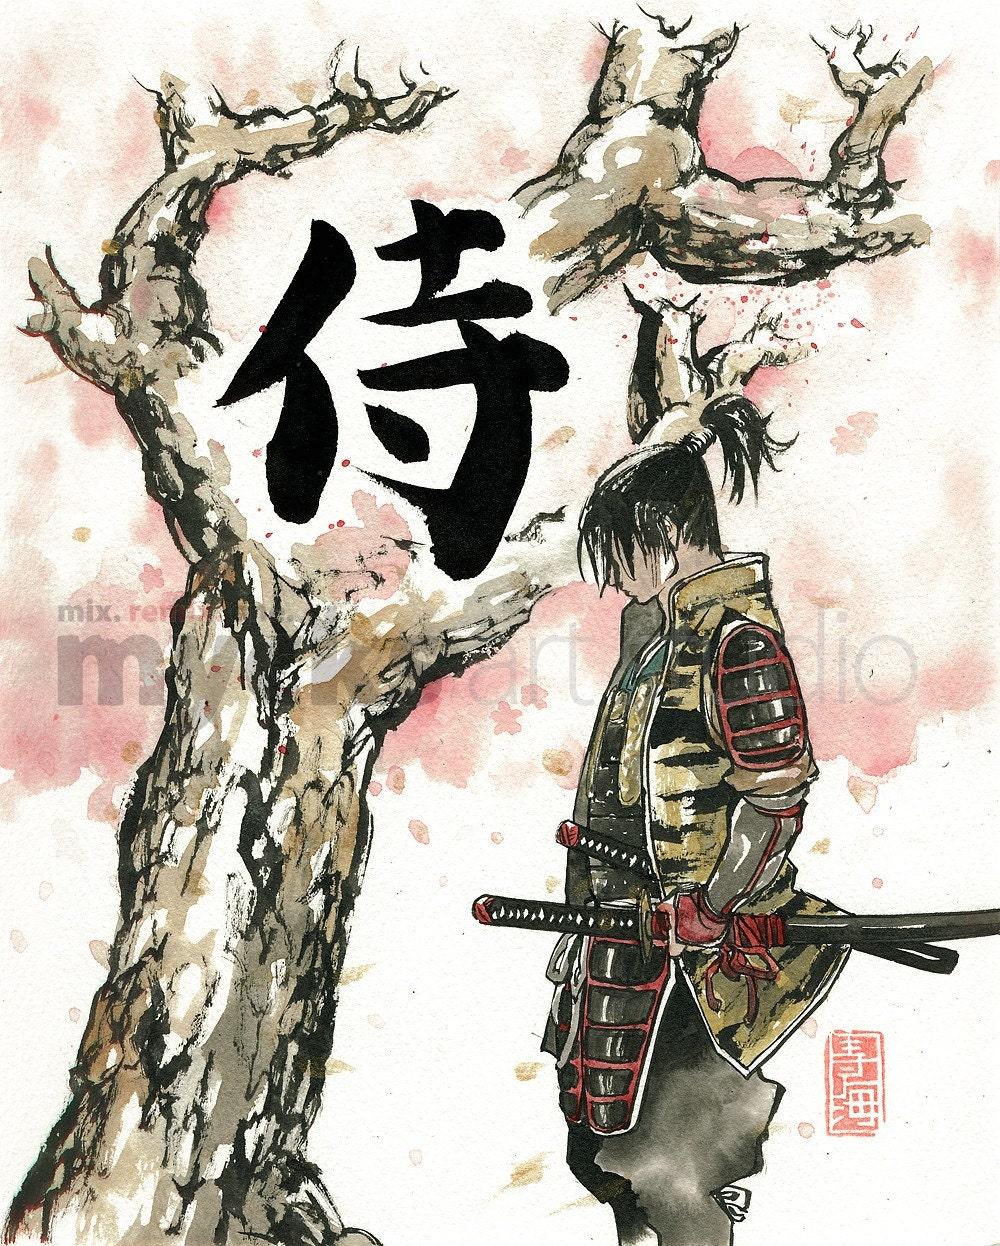 Print Samurai Under Sakura Cherry Blossoms Tree 8x10